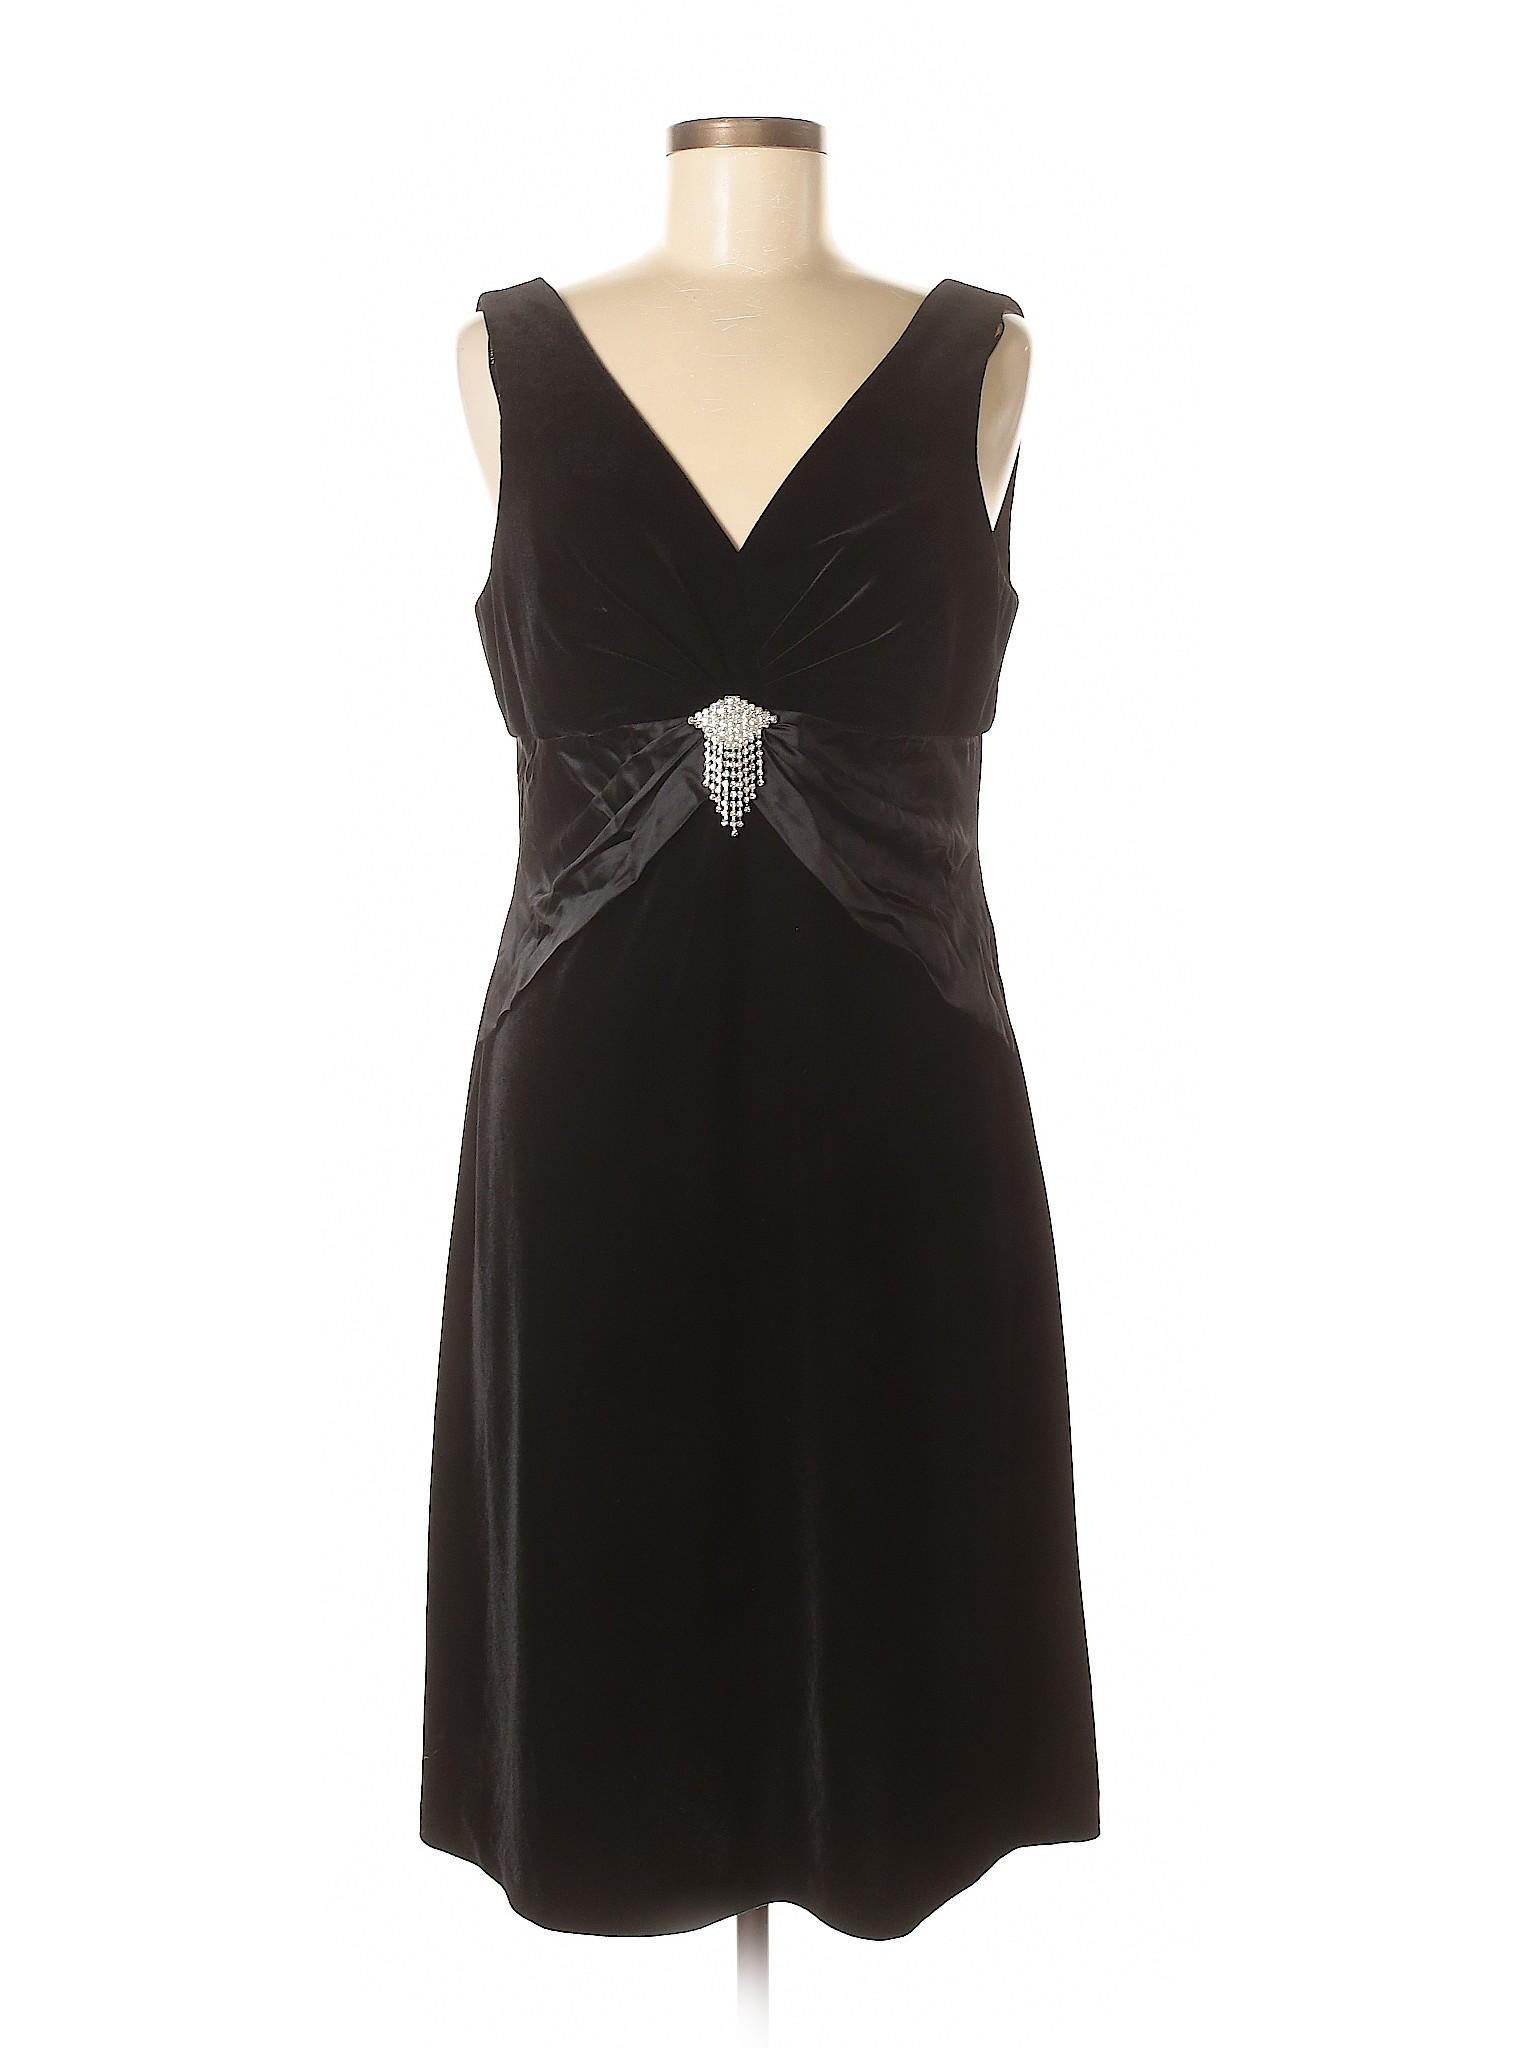 Dress Winter Cachet Boutique Cocktail Jolie Clothing Joie Midi Nude M Xtdawq4ud